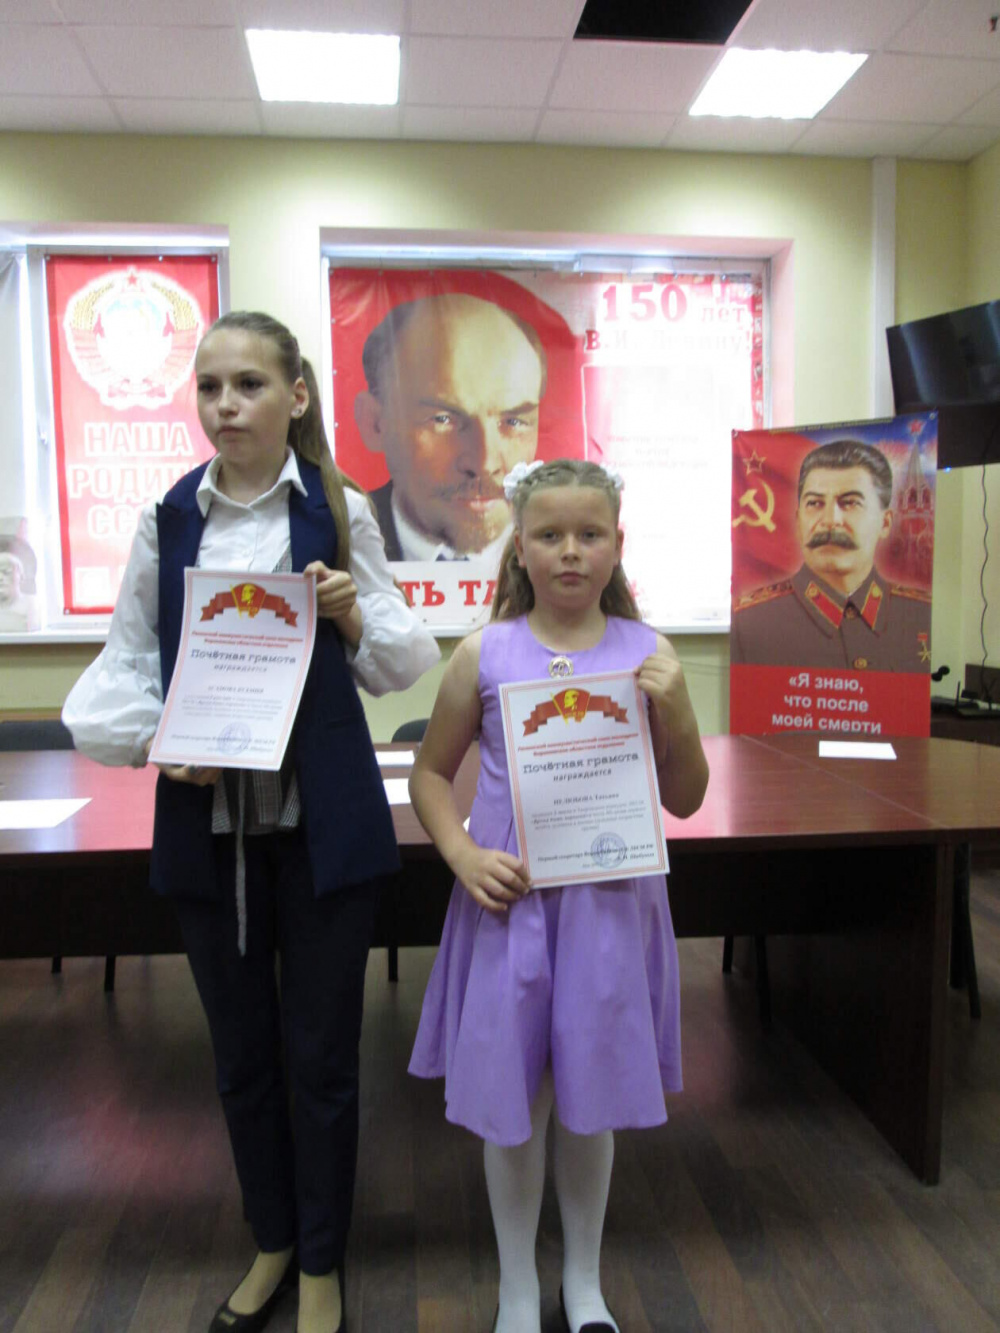 Стихи школьниц из Народного отметили на областном конкурсе